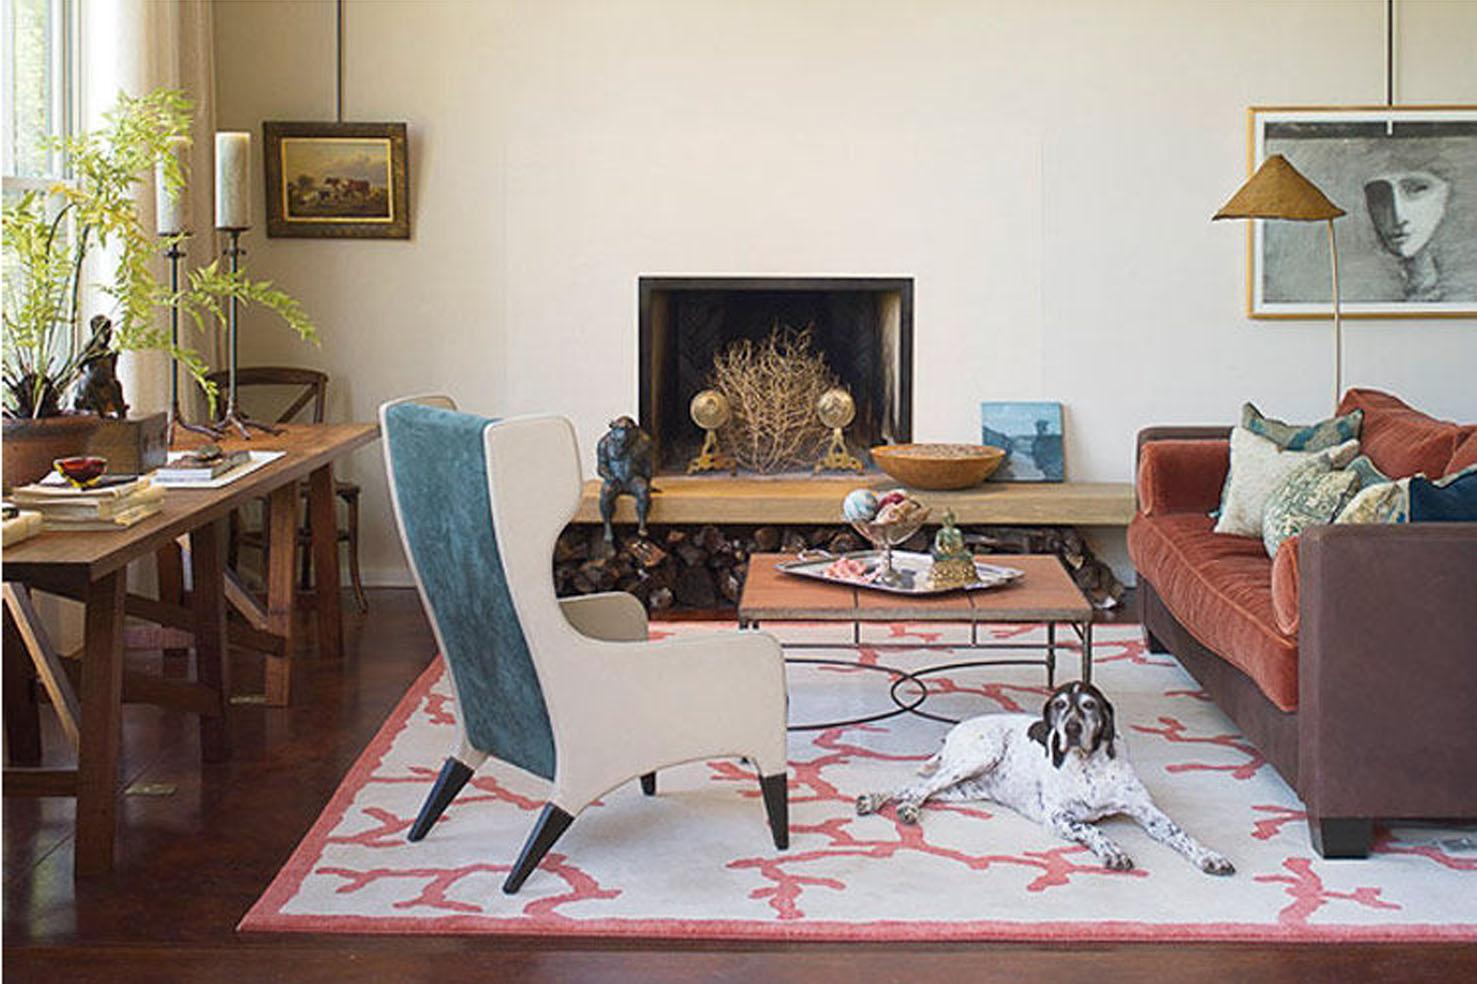 Extravagant Interior Design Ideas From Gary Spain